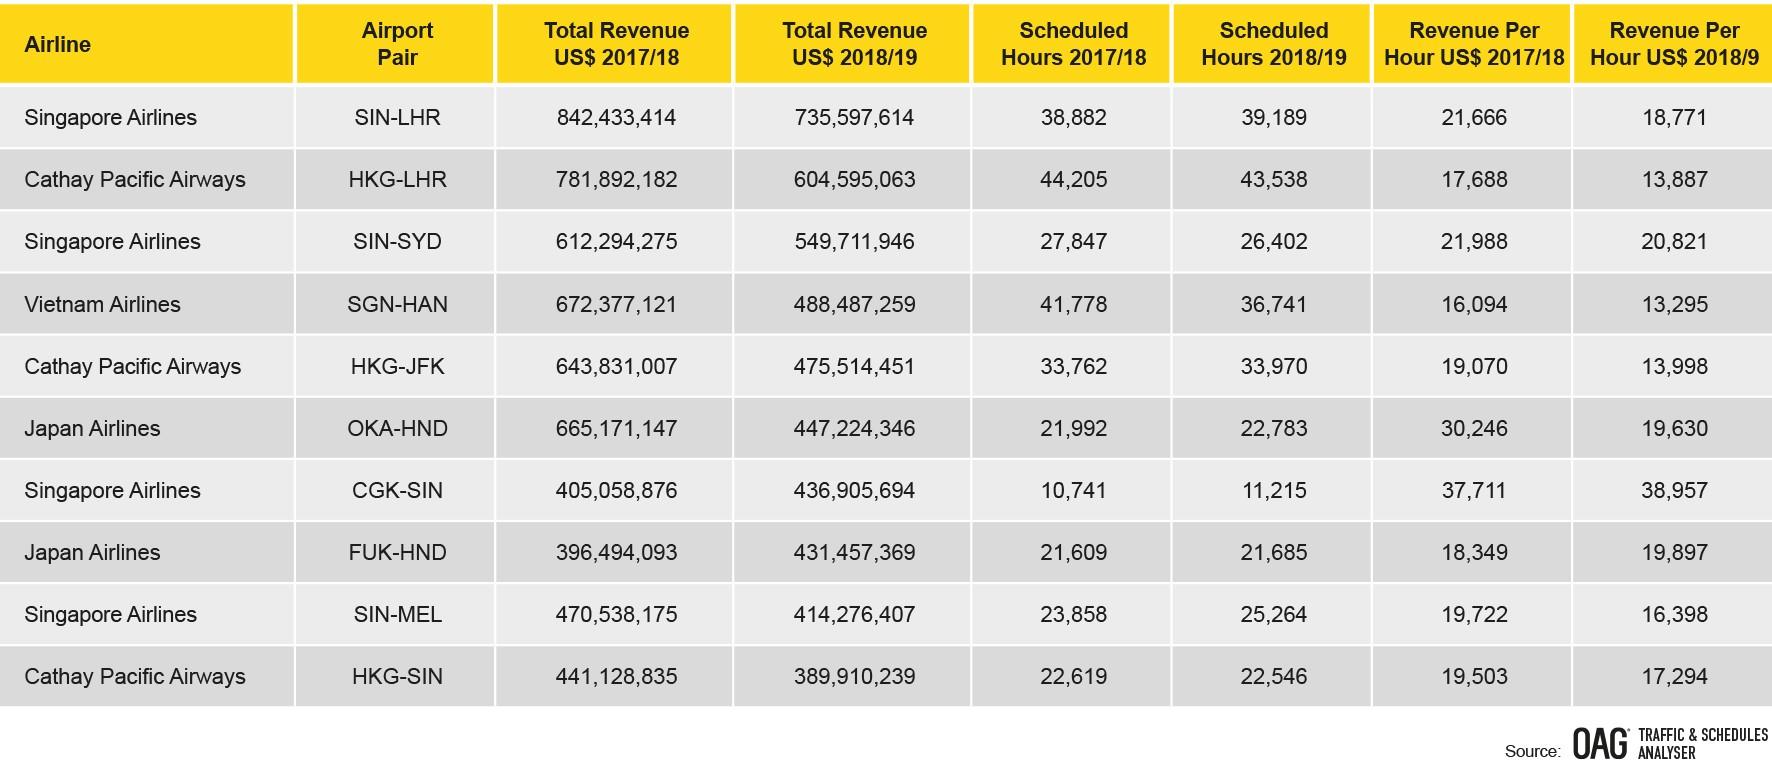 asia-top-ten-highest-revenue-routes-by-airline-april-2018-march-2019